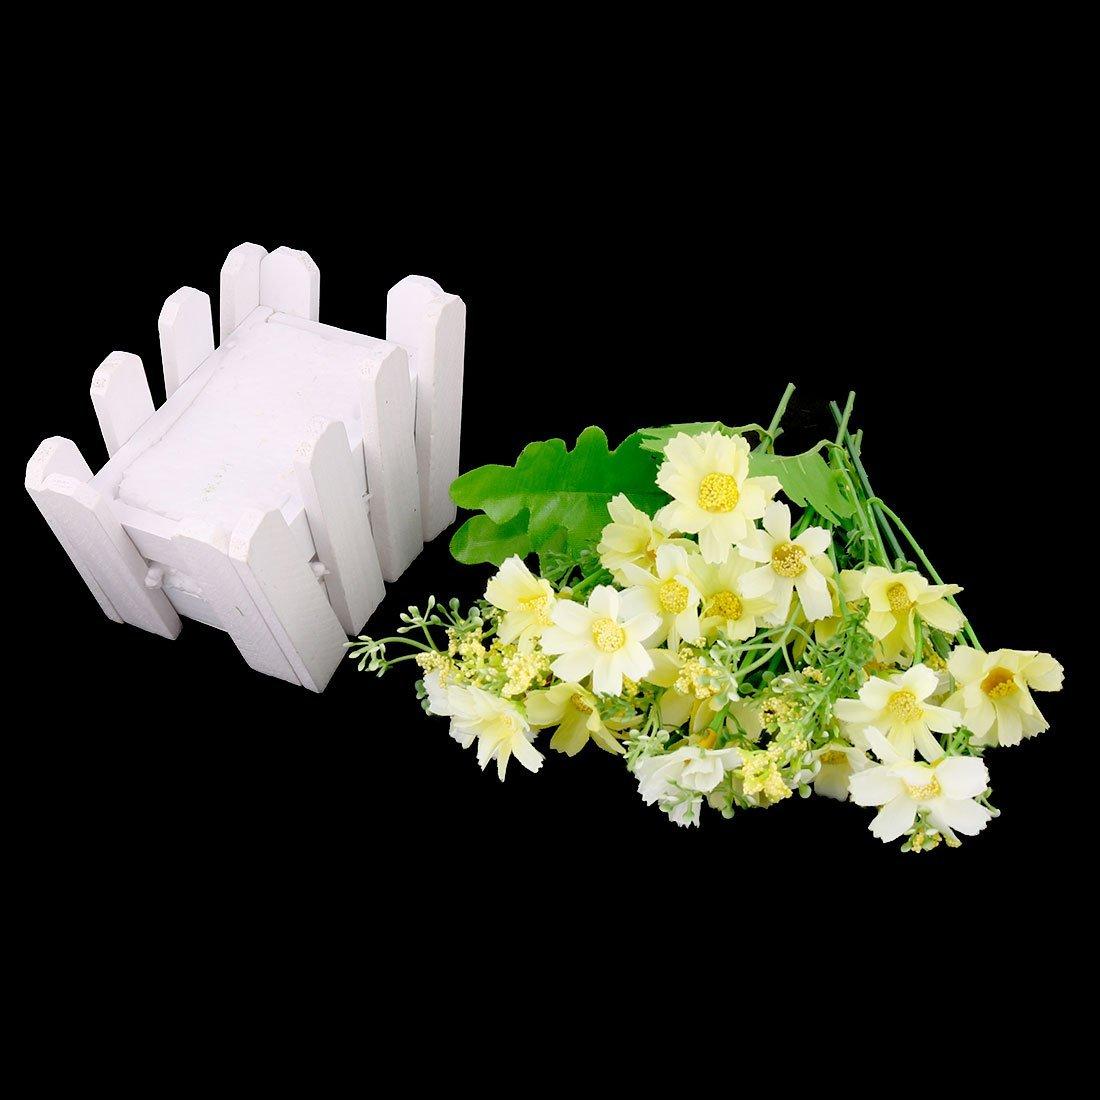 Amazon.com: eDealMax Plantas Tela de la boda de la Margarita Brotes de sobremesa ornamento Artificial de Emulational de Flores: Home & Kitchen